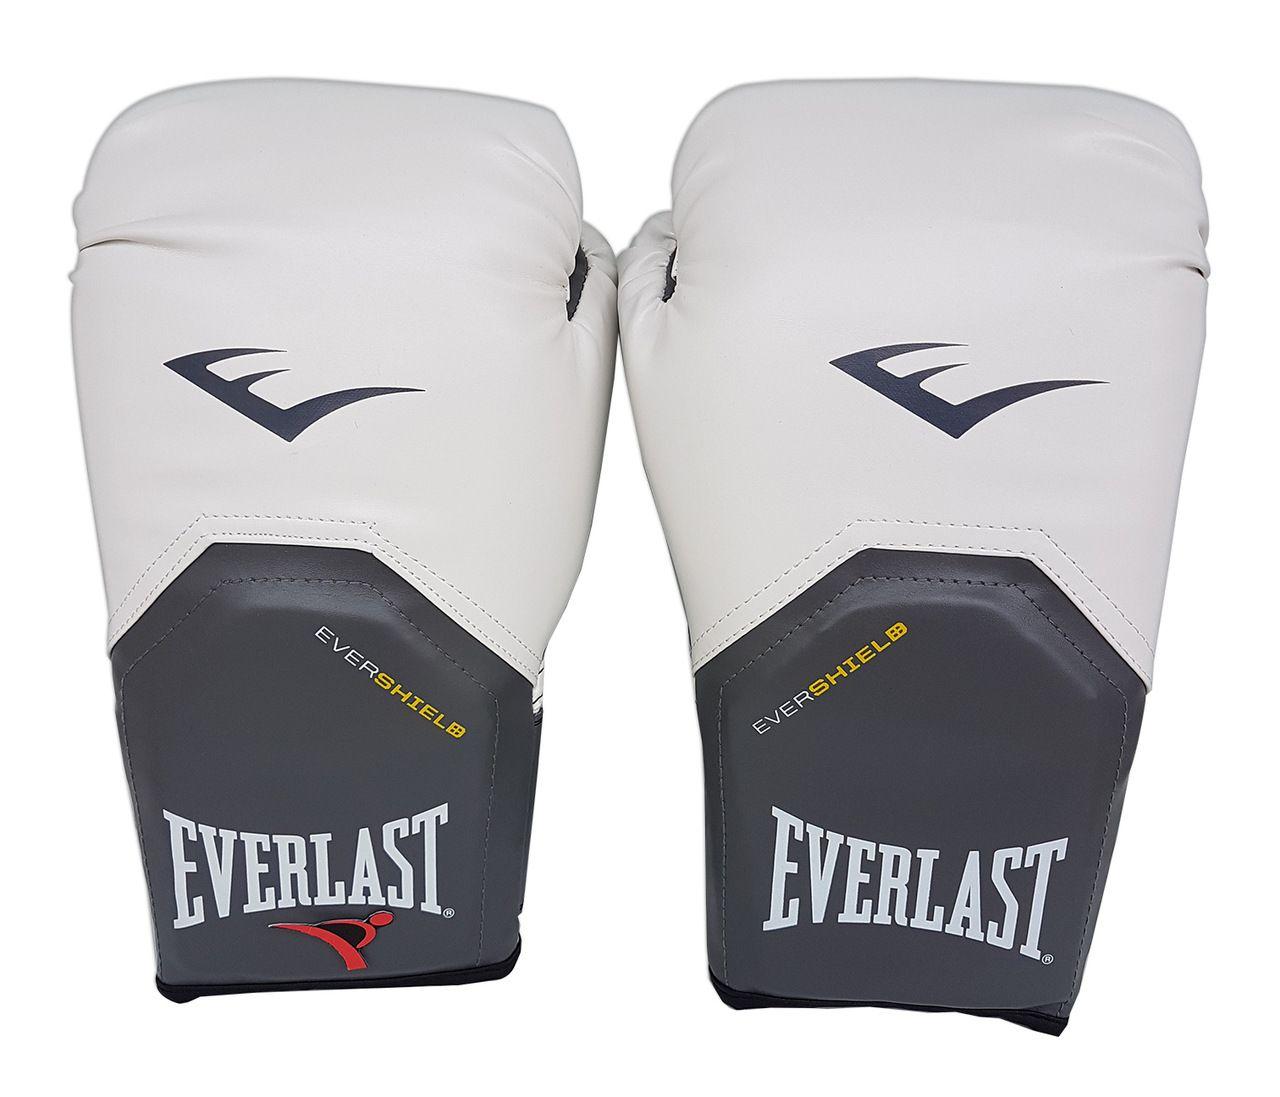 Luva de Boxe / Muay Thai 12oz - Branco - Pro Style - Everlast  - PRALUTA SHOP